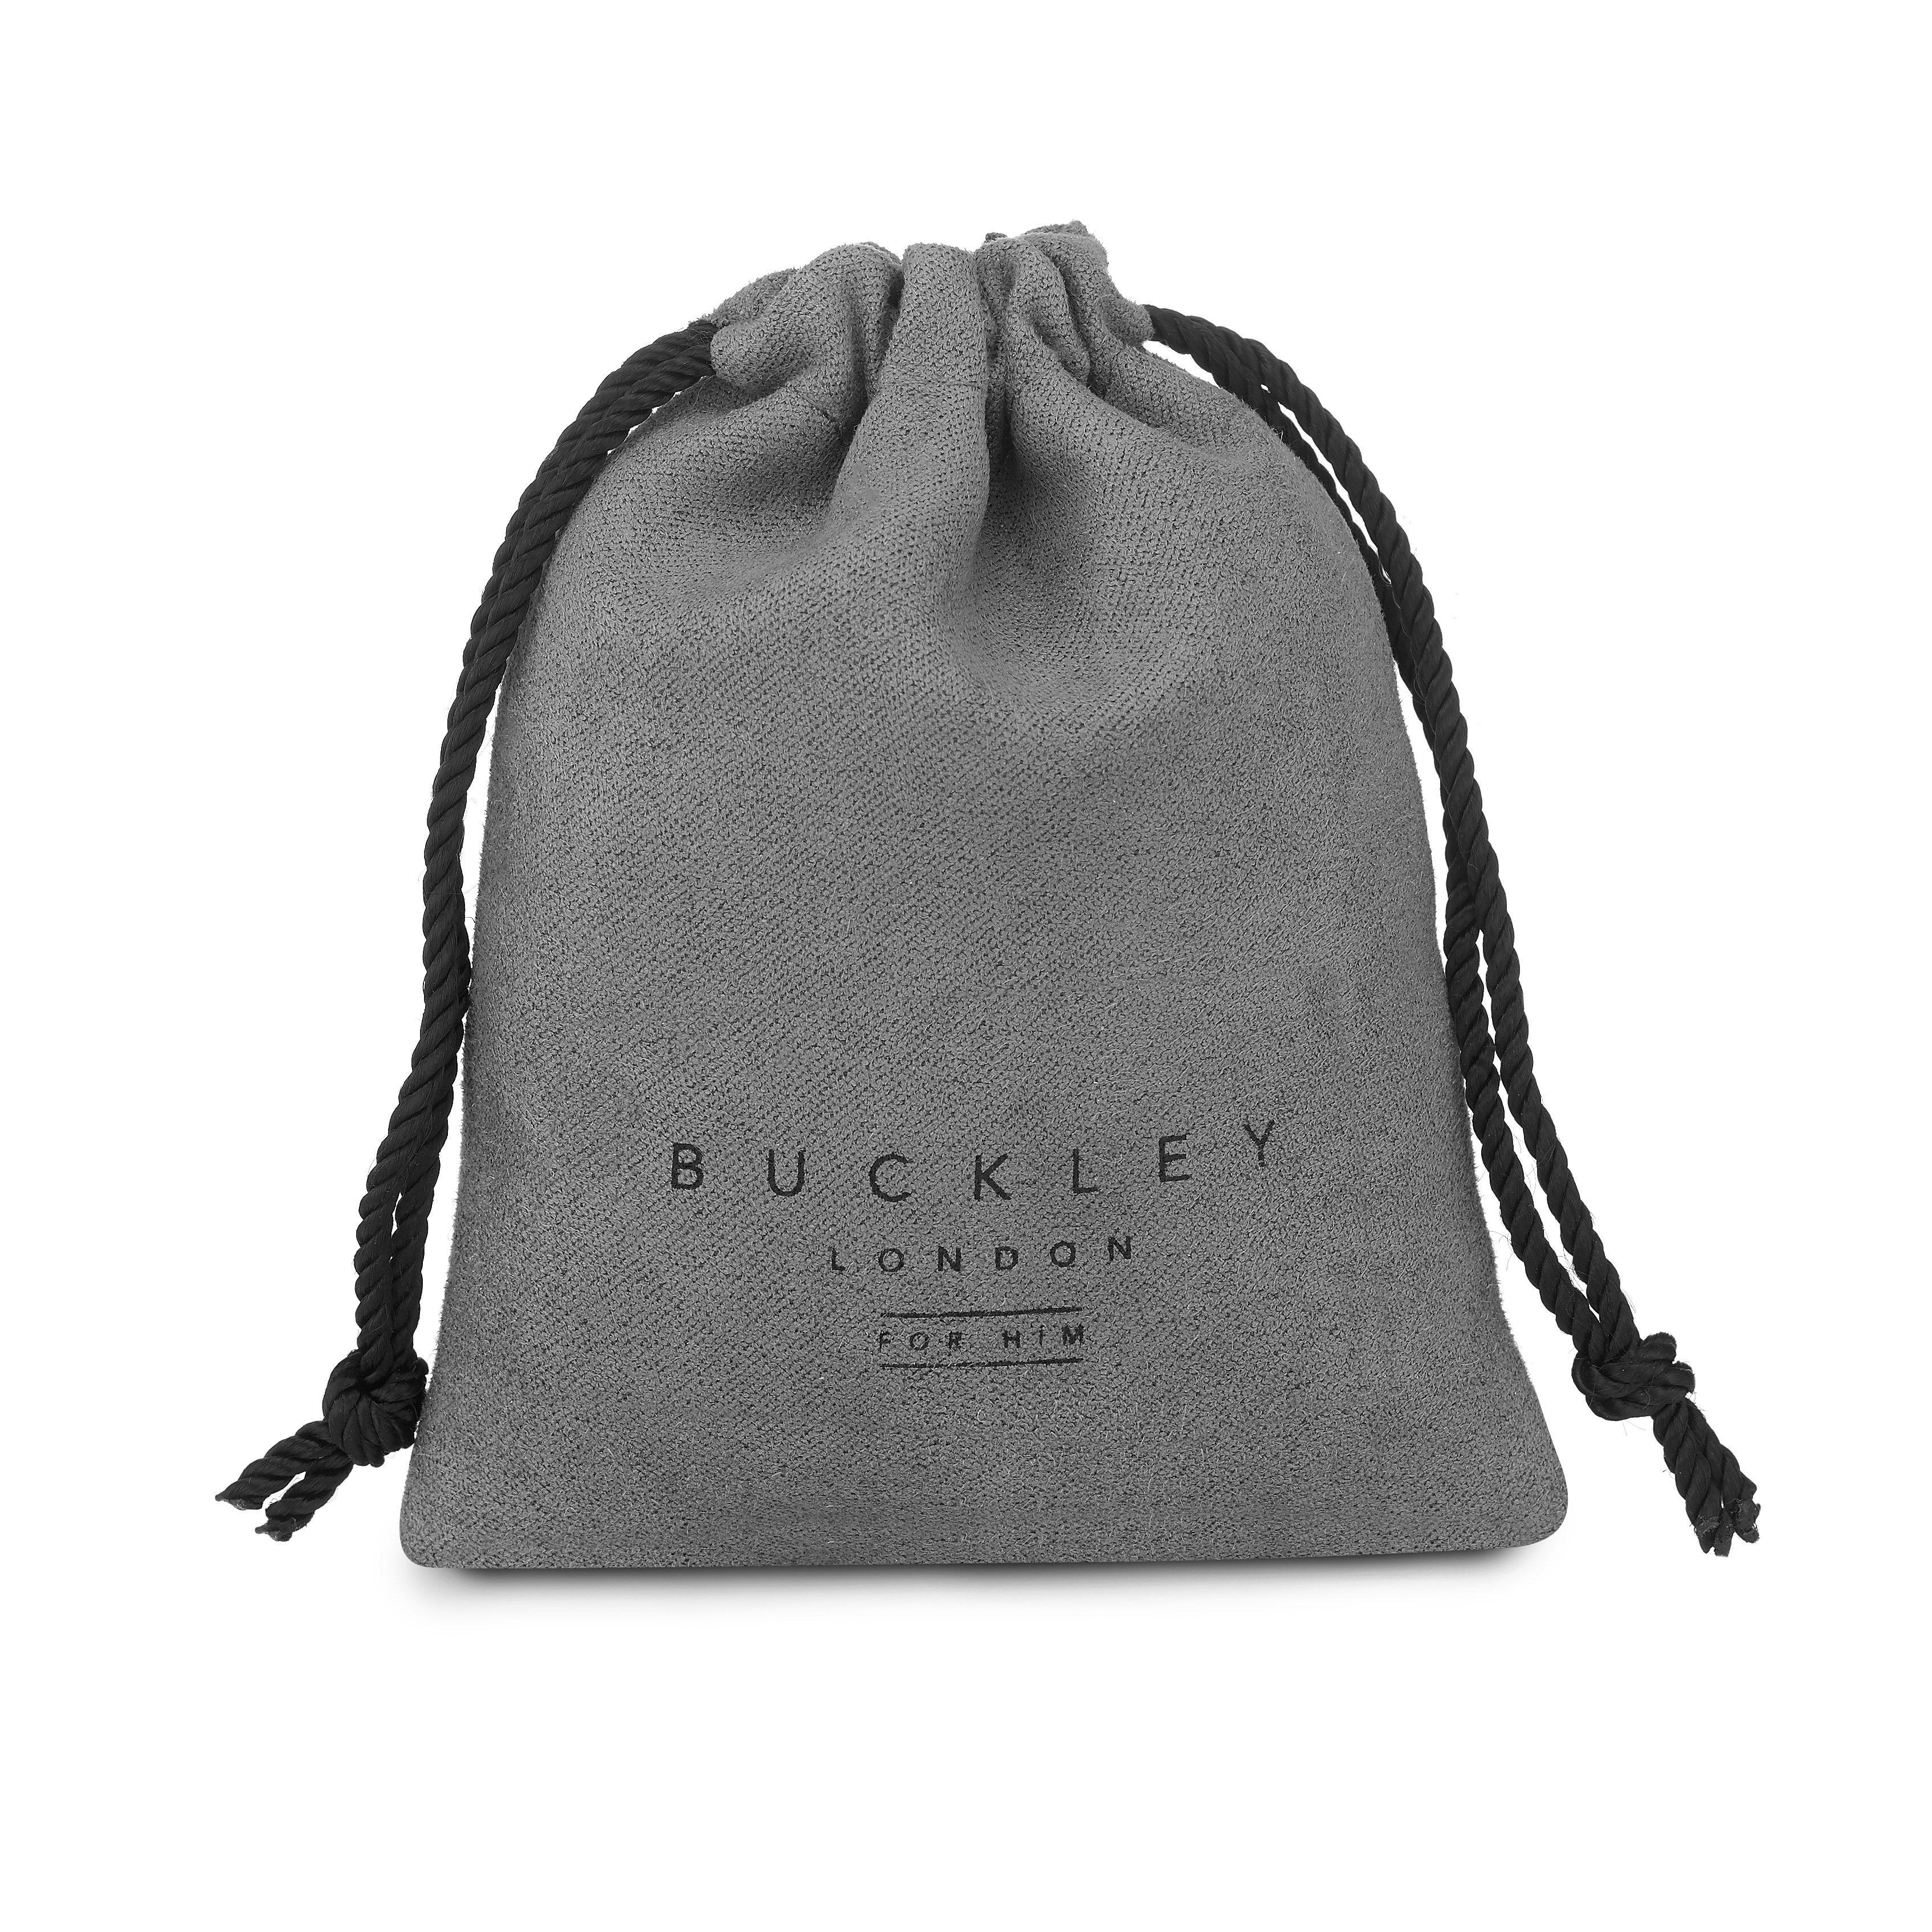 Buckley London For Him Logan Beaded Bracelet - Gift Pouch